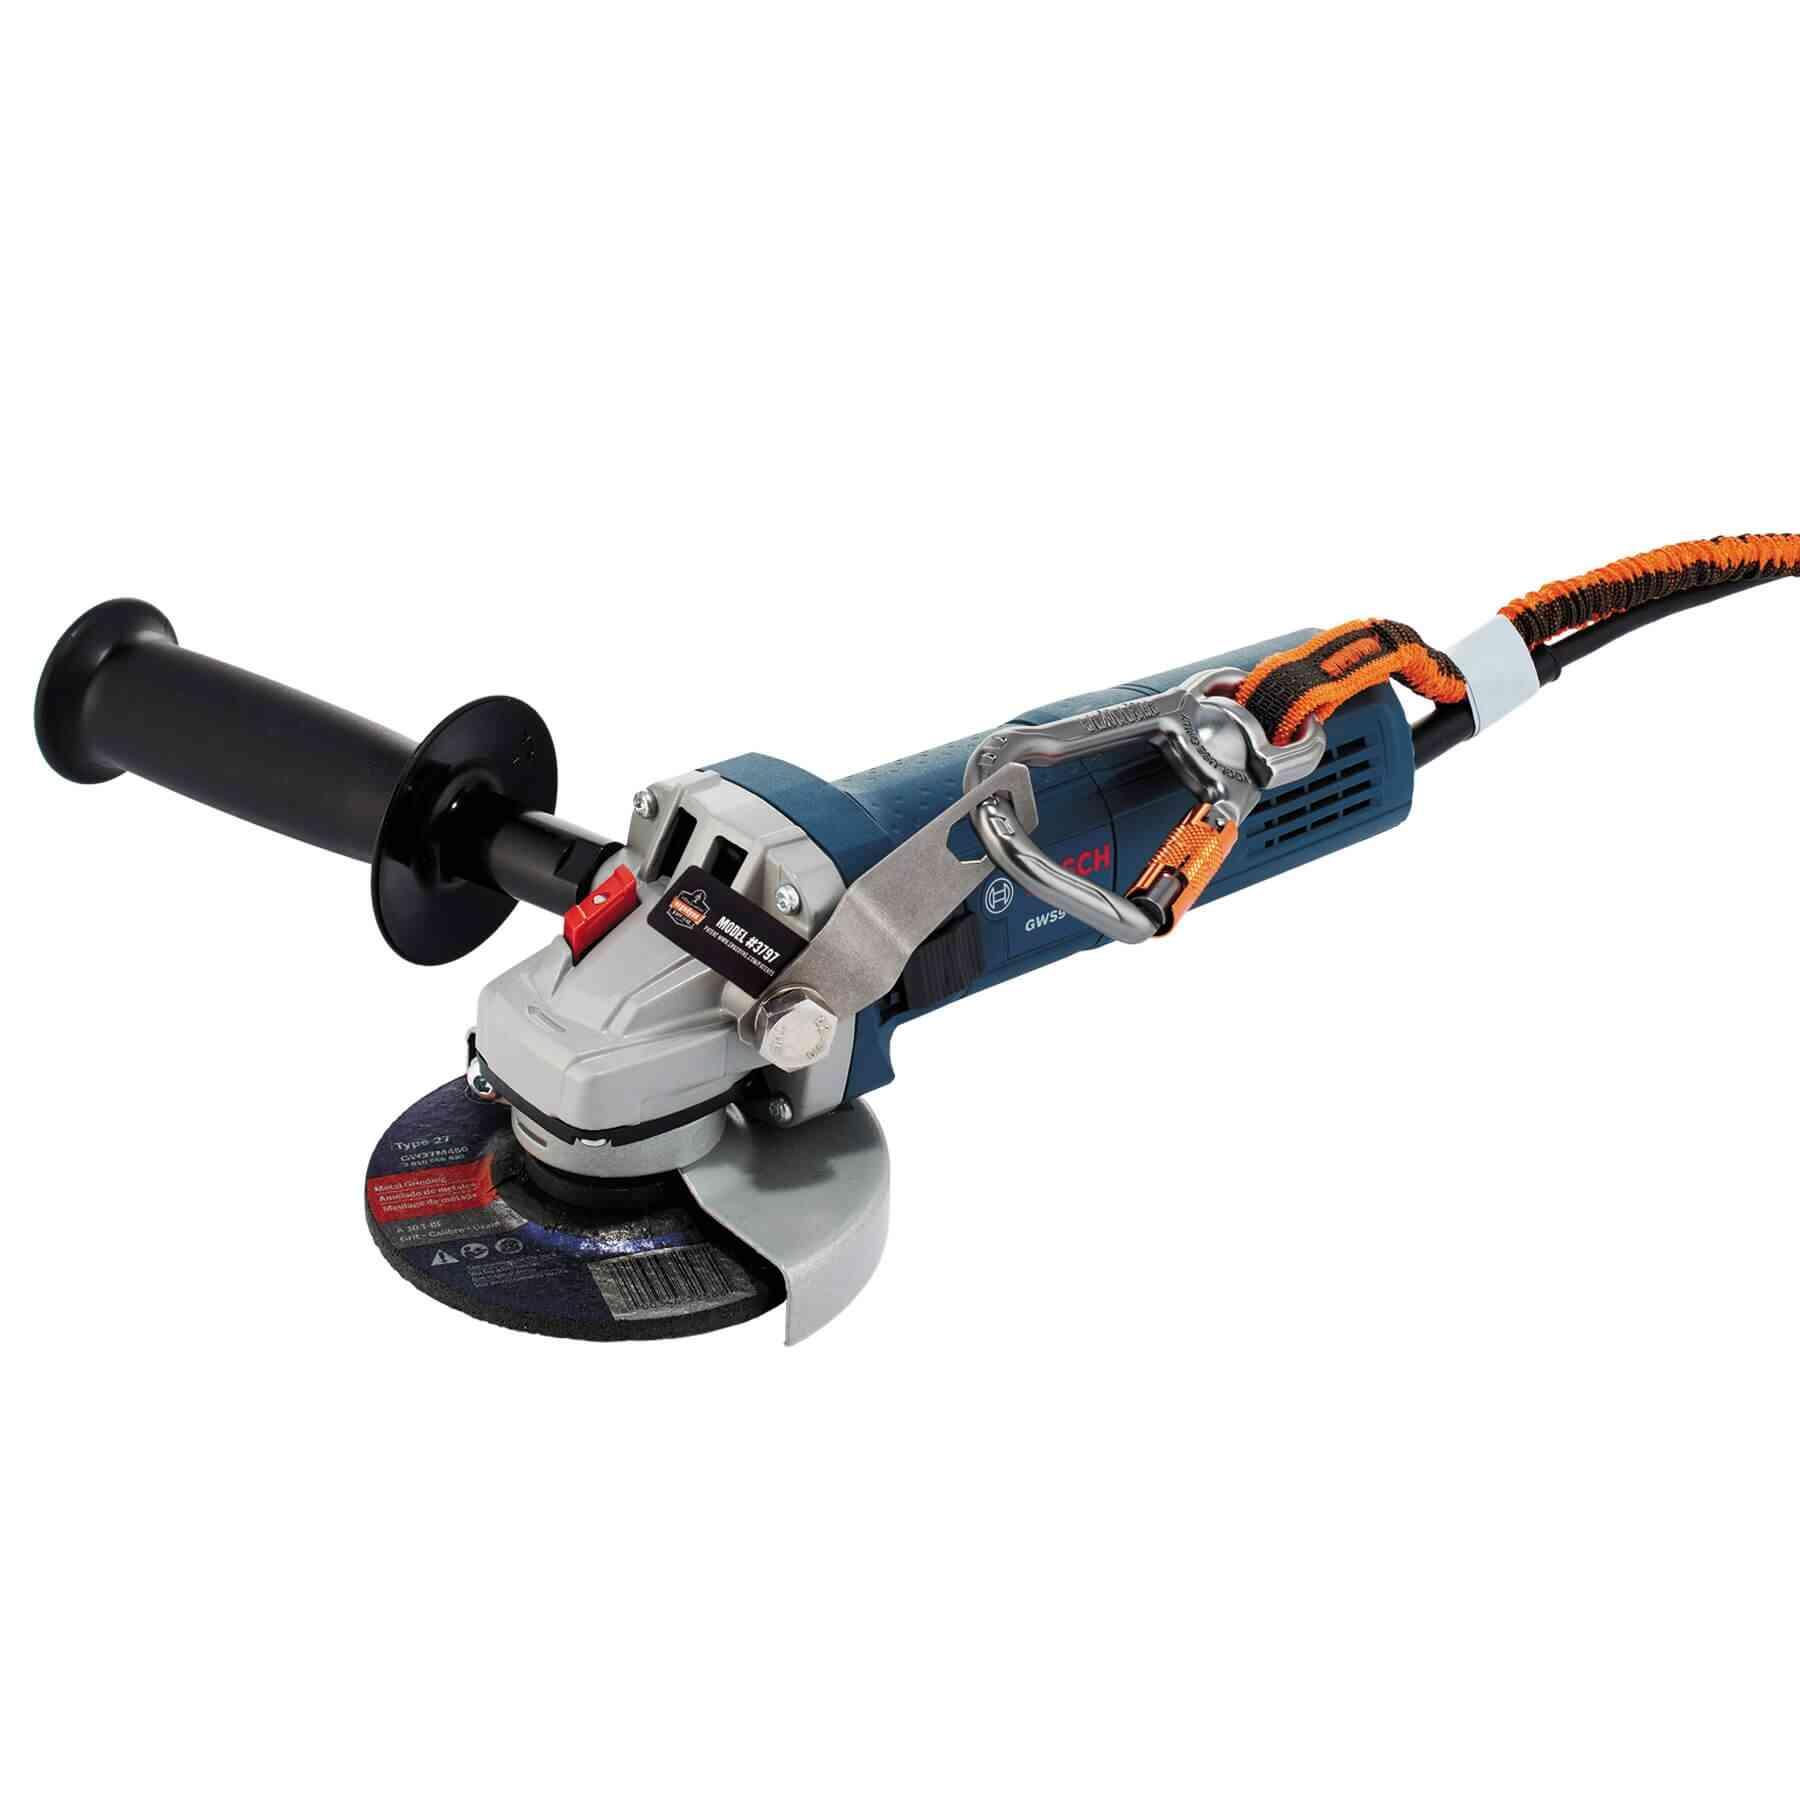 Squids 3797 Power Tool Bracket - Grinder Tool Trap